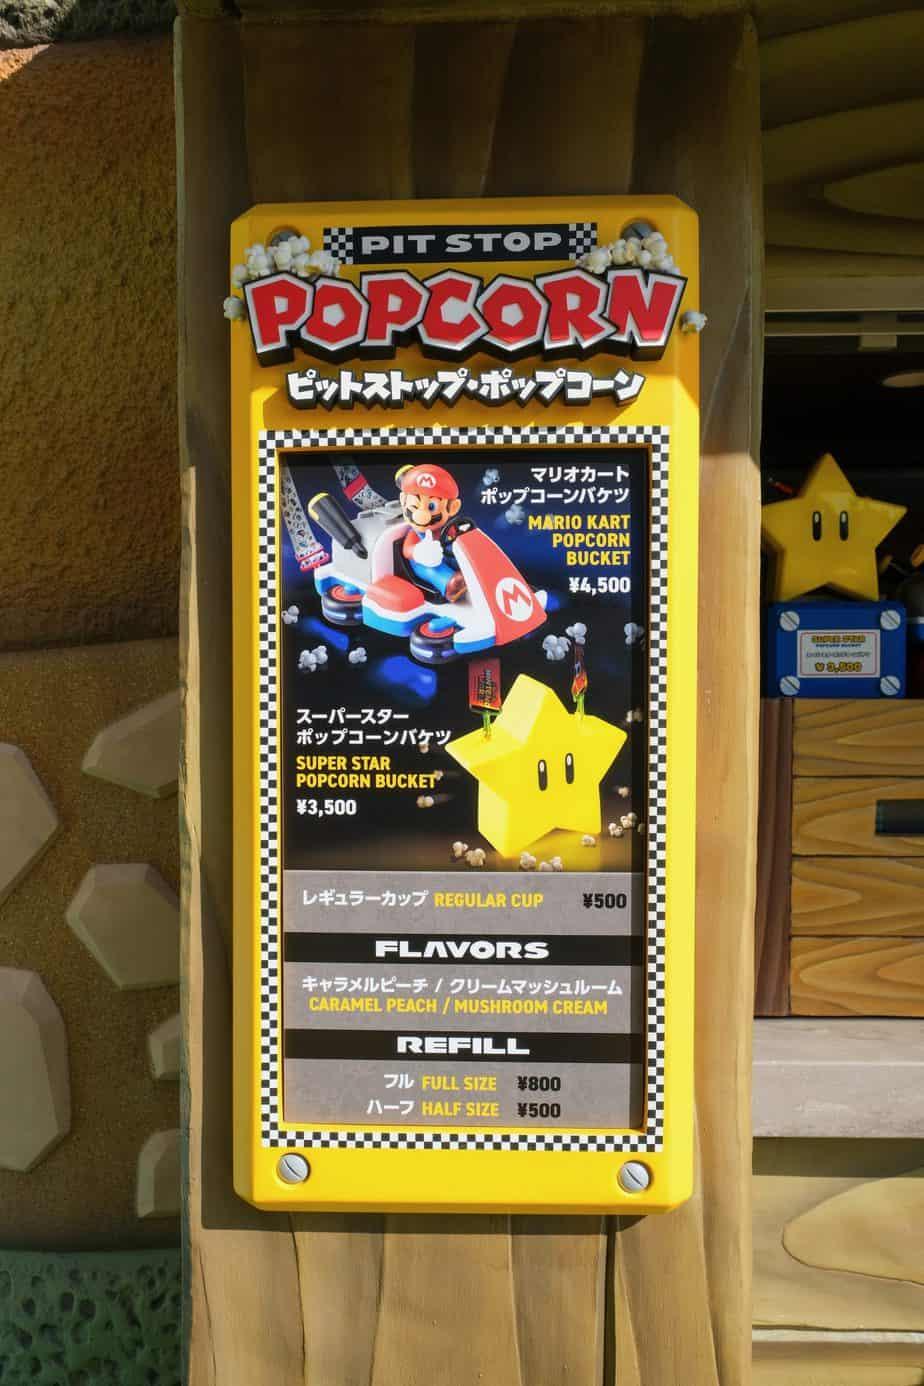 Super Nintendo World Popcorn Bucket Signage